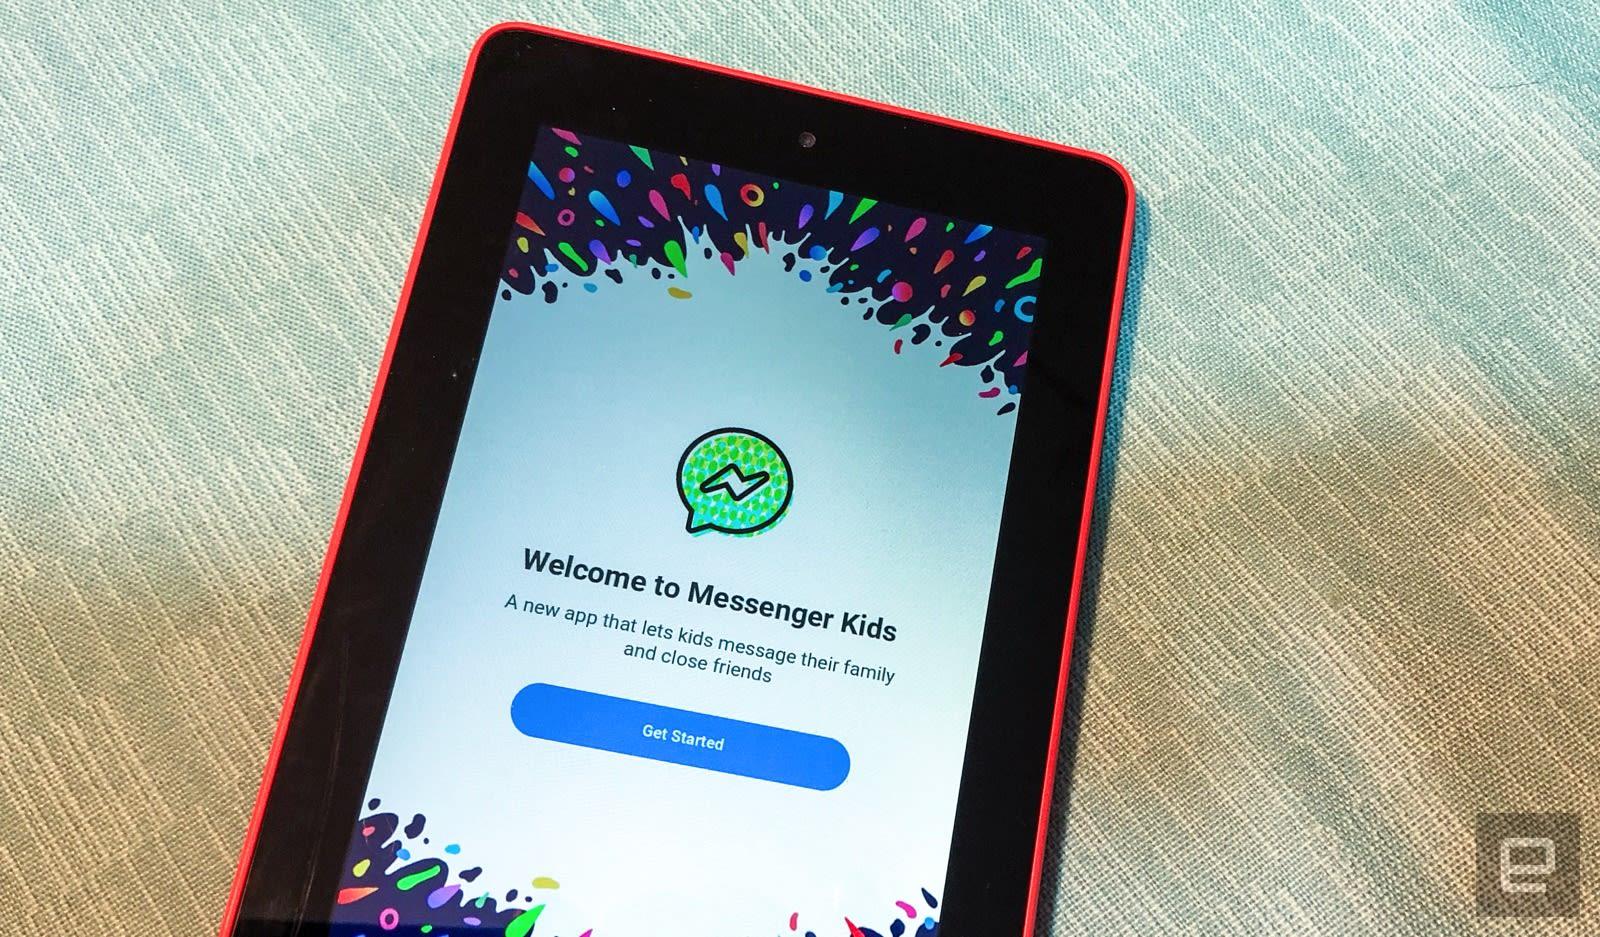 Facebook's Messenger Kids app arrives on Amazon Fire tablets